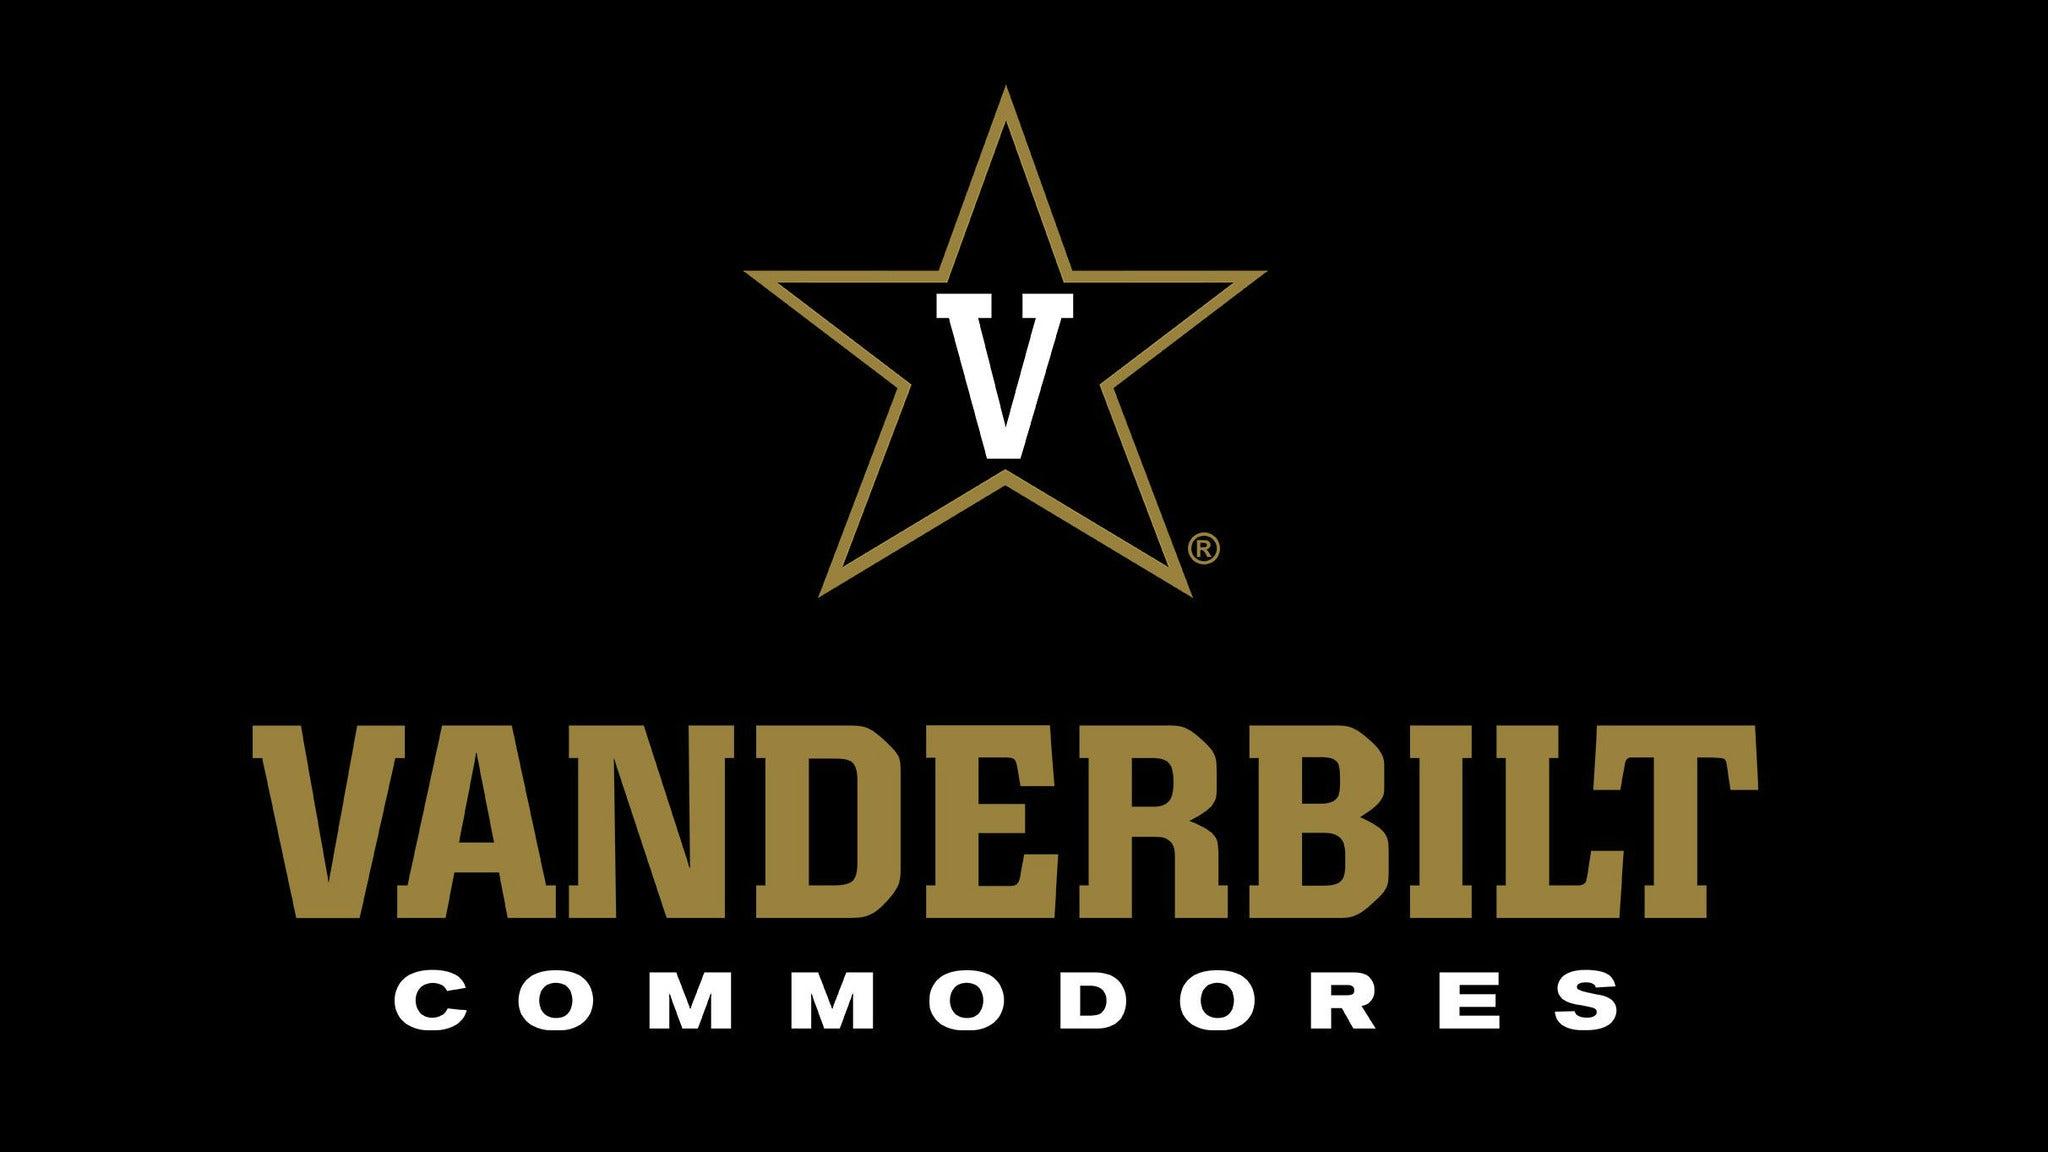 Vanderbilt Commodores Mens Basketball vs. Texas A&M Corpus Christi Islanders Basketball